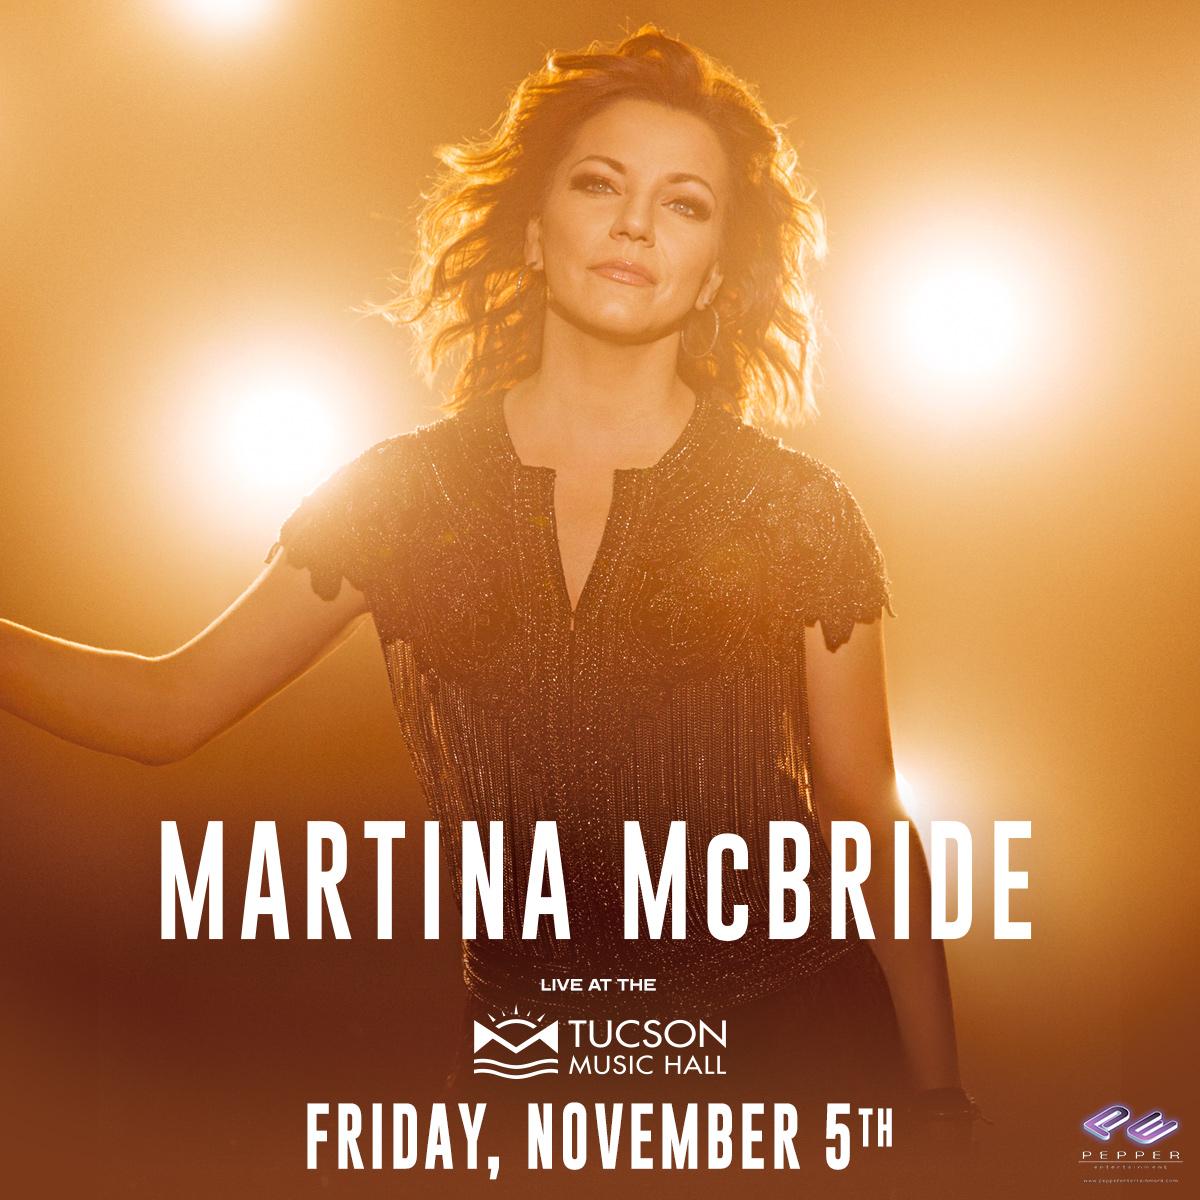 11/5/21 – Martina McBride at Tucson Music Hall